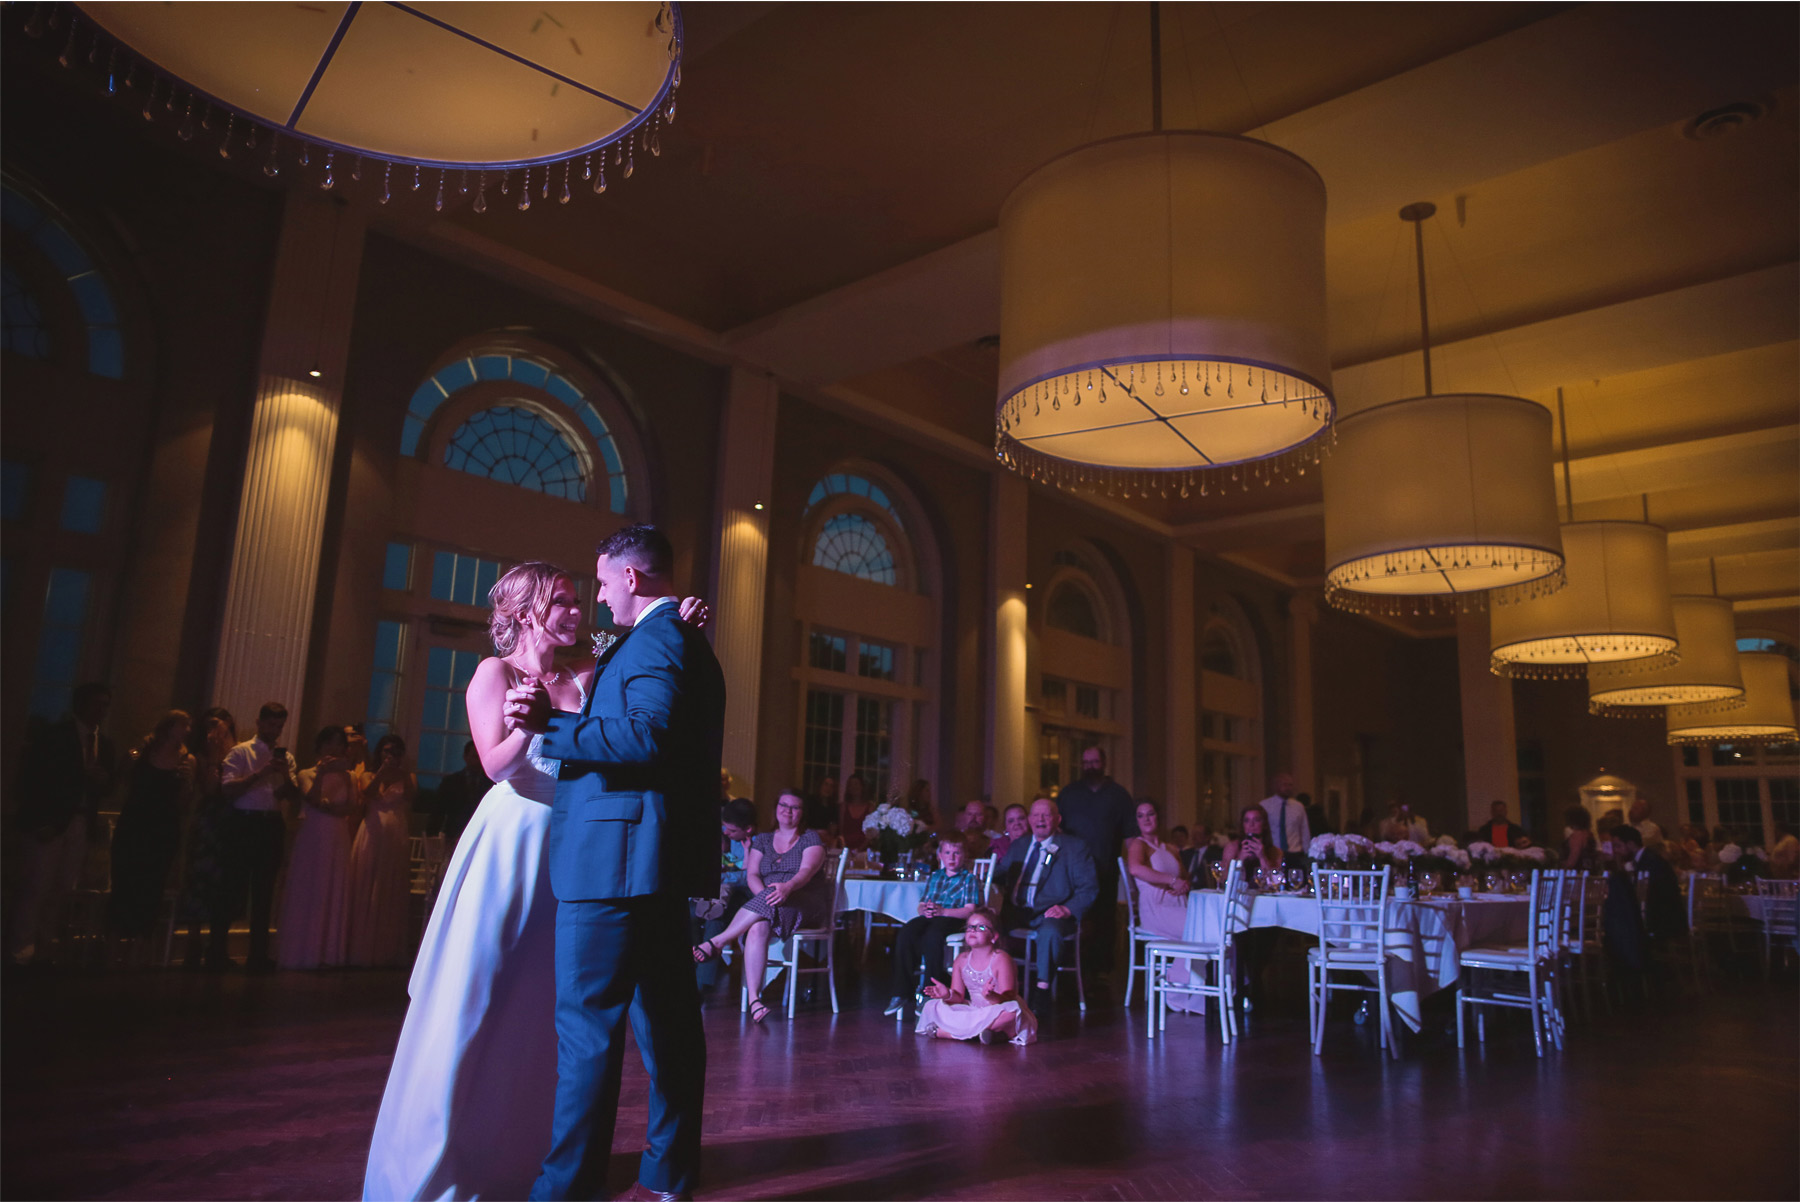 18-Minneapolis-Minnesota-Wedding-Andrew-Vick-Photography-Calhoun-Beach-Club-Reception-FIrst-Dance-Samantha-and-Ryan.jpg